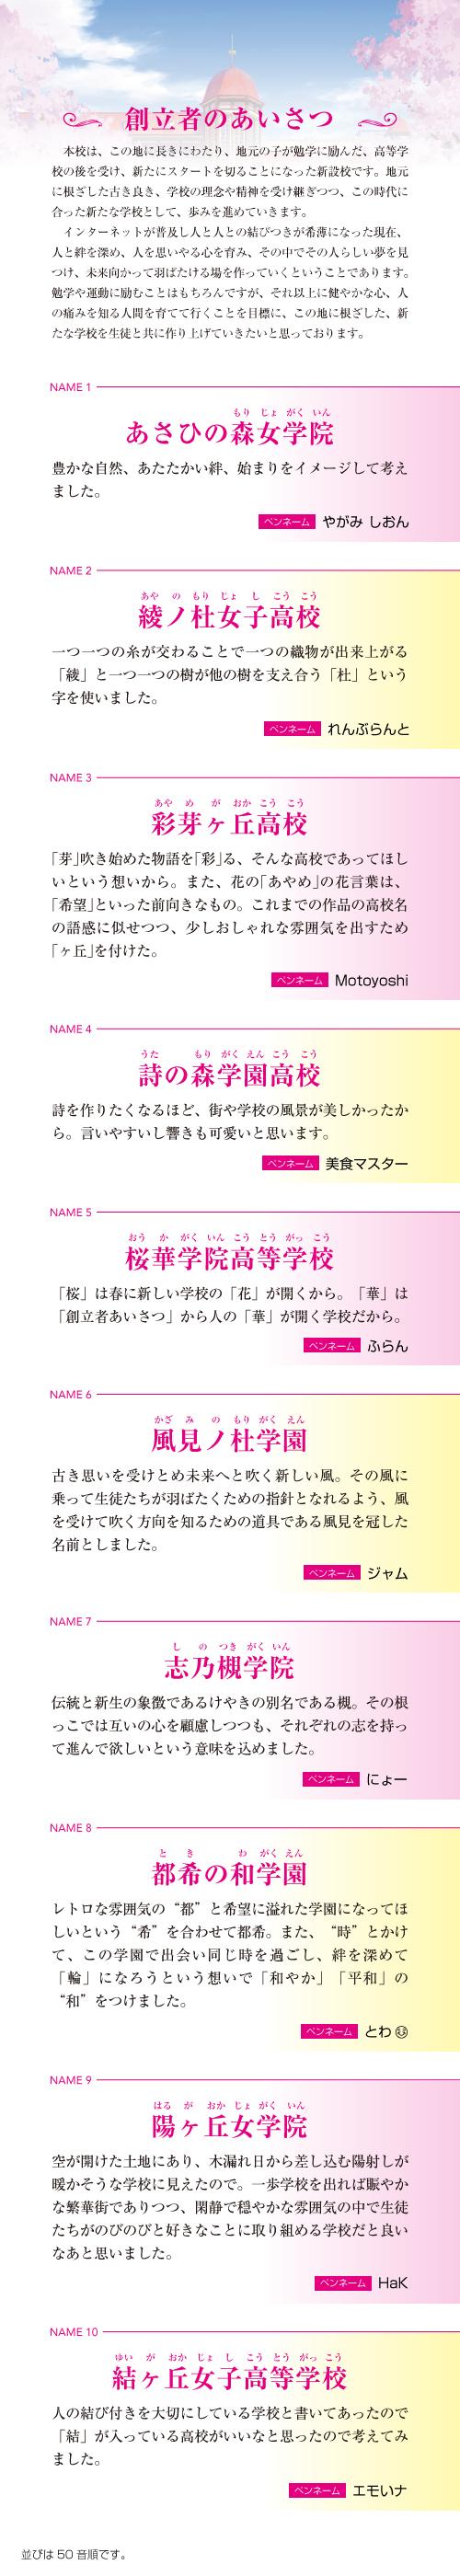 0409_school_name_WEB-01 (1)